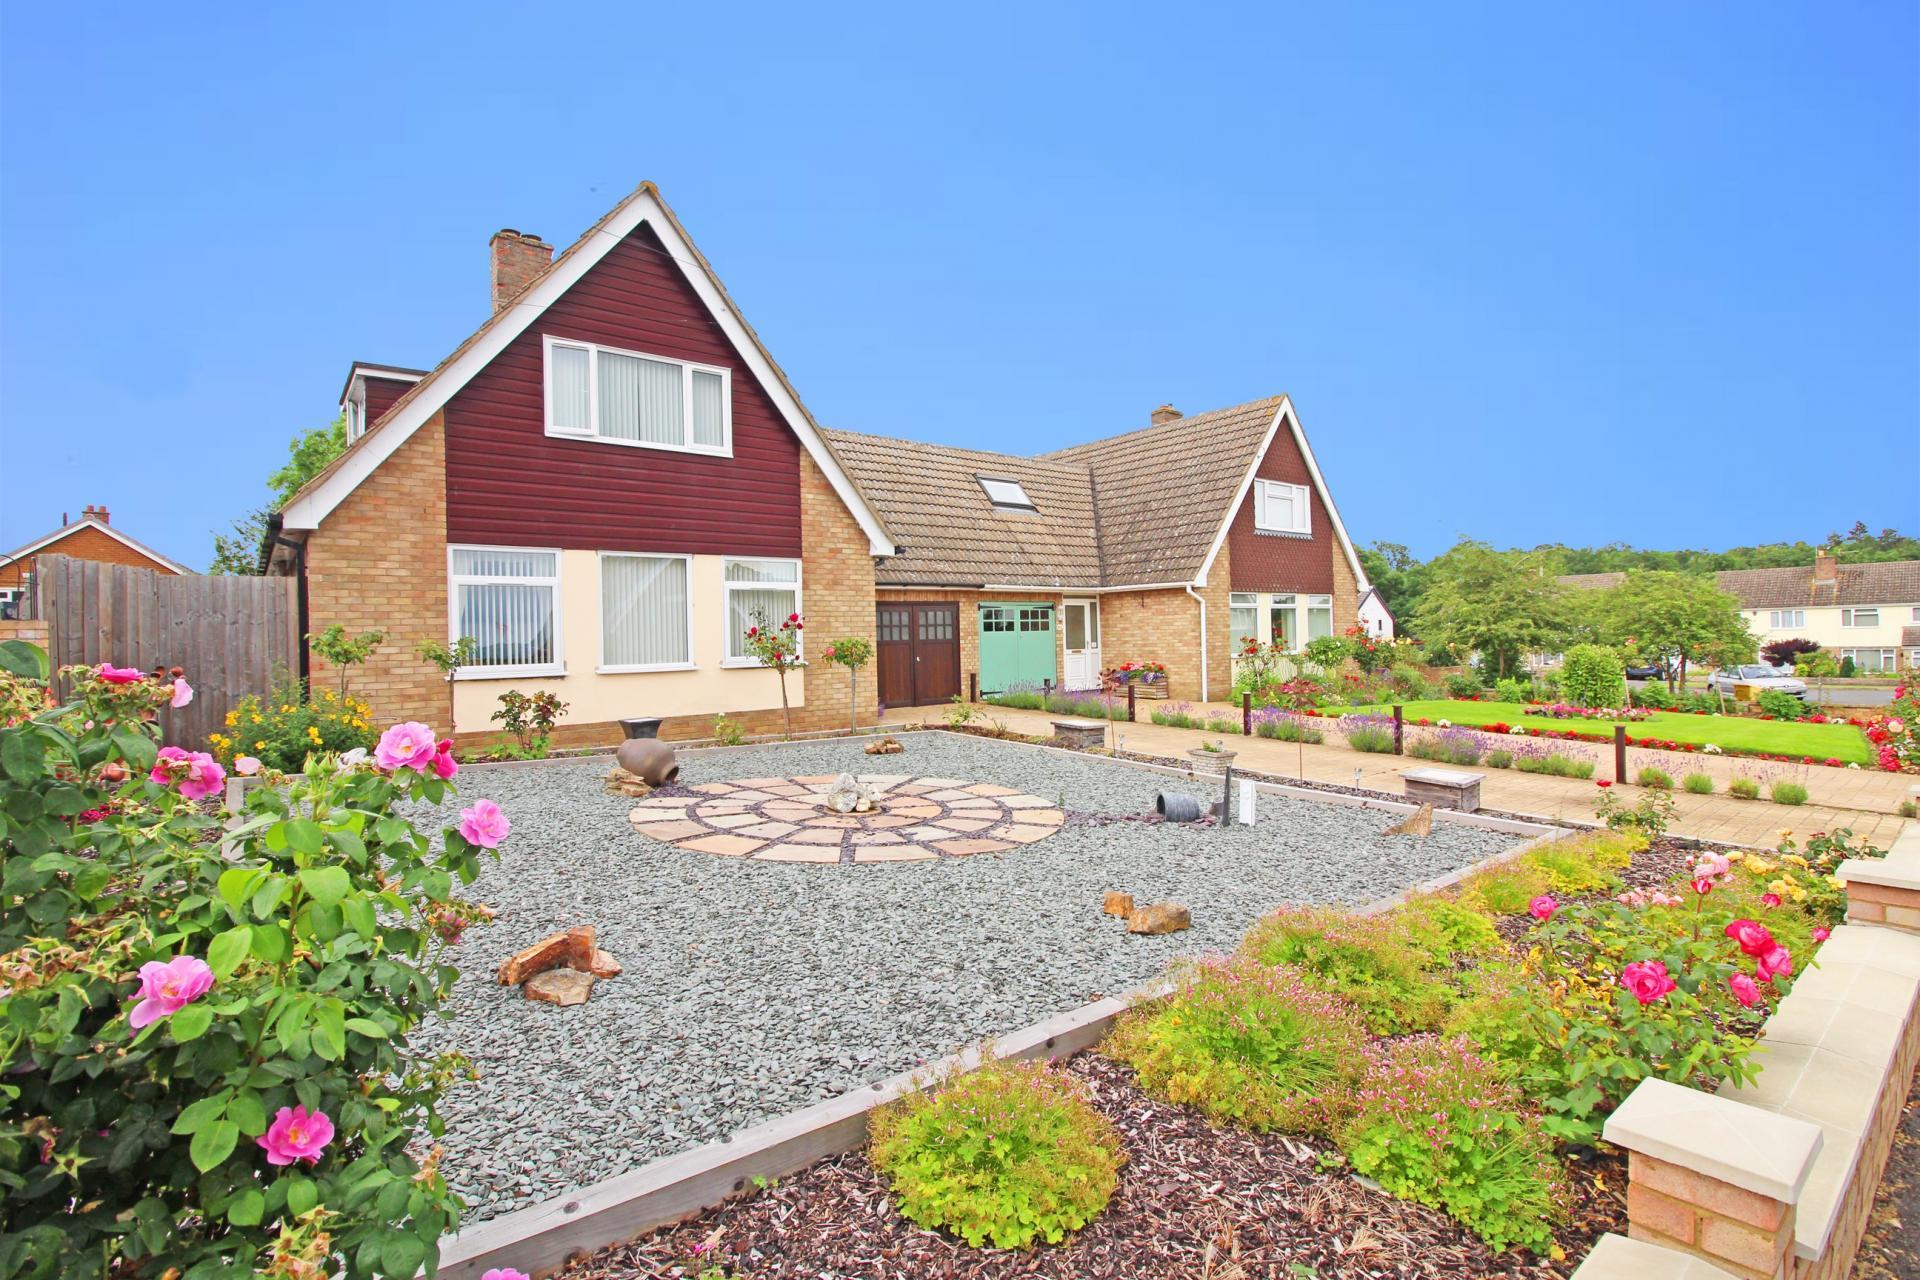 chalet bungalow family home in Great Stukeley Cambridgeshire